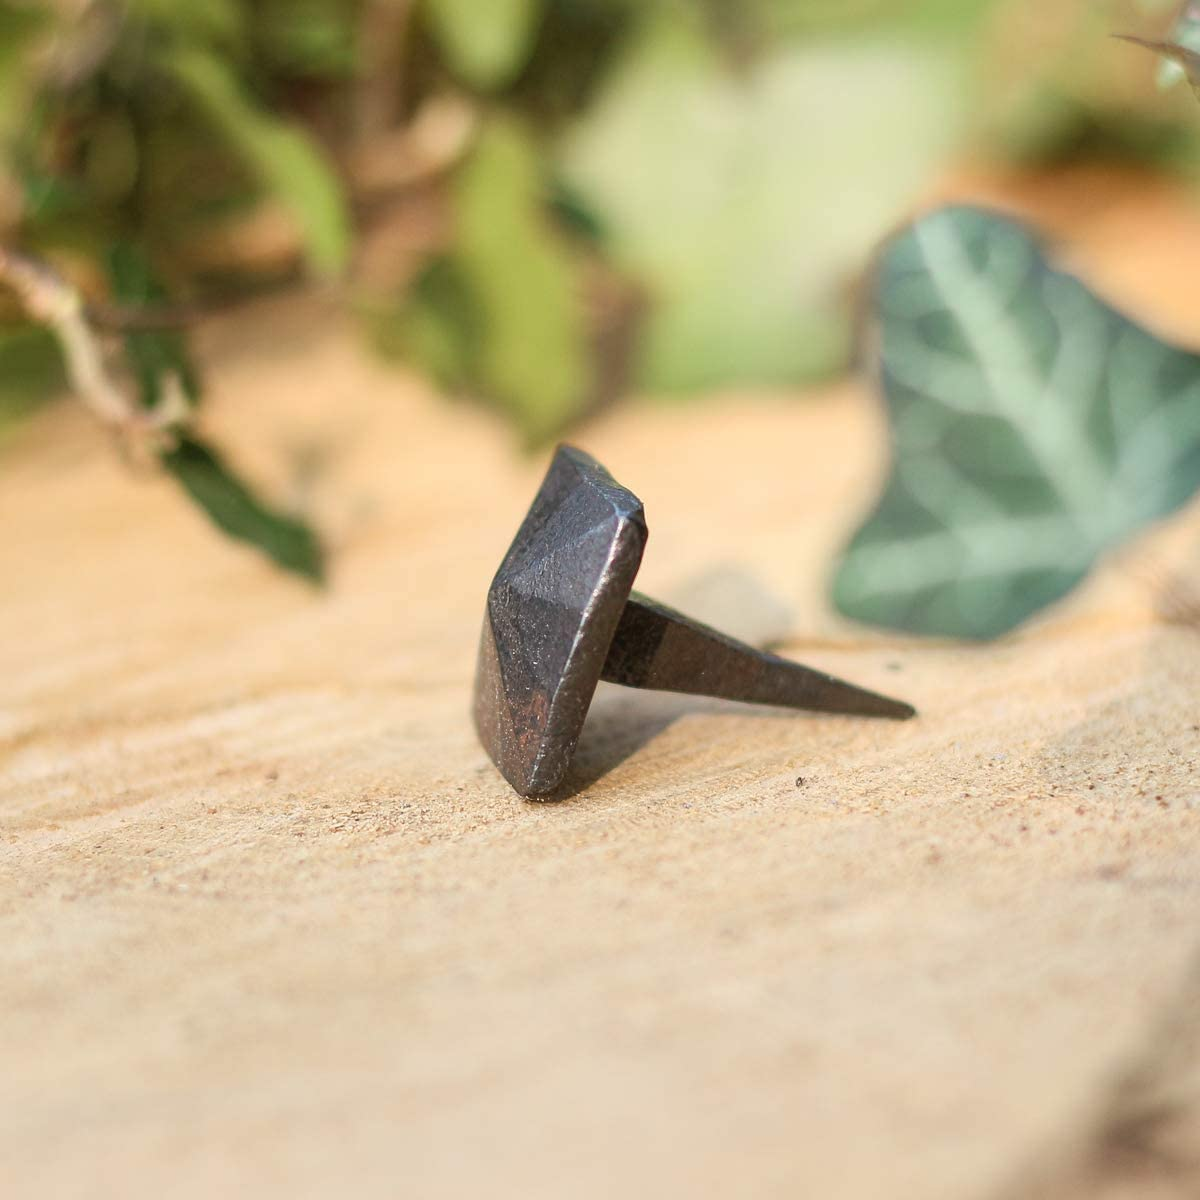 Antike N/ägel geschmiedet Nagel schmiedeeisen Nagel Antikas Ziernagel viereckig